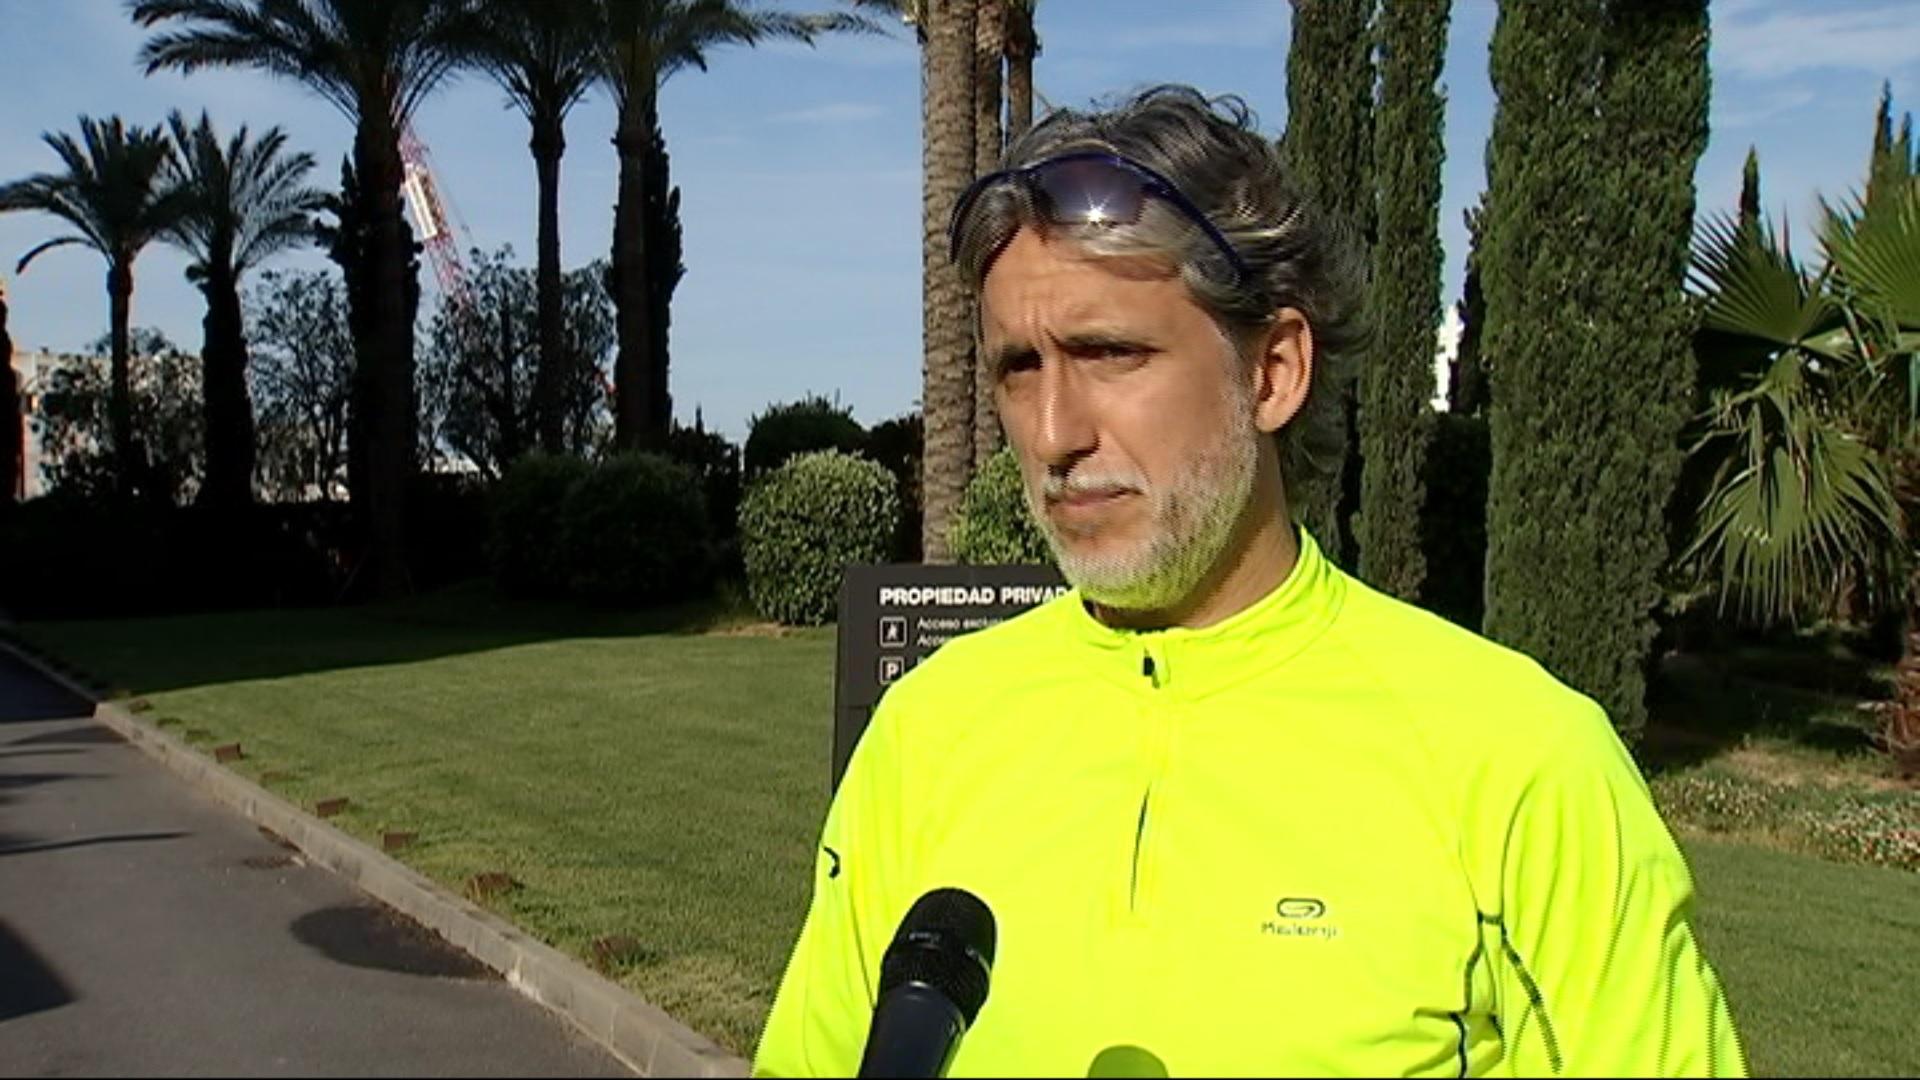 Pablo+Alfaro+es+resigna+i+accepta+el+play-off+expr%C3%A9s